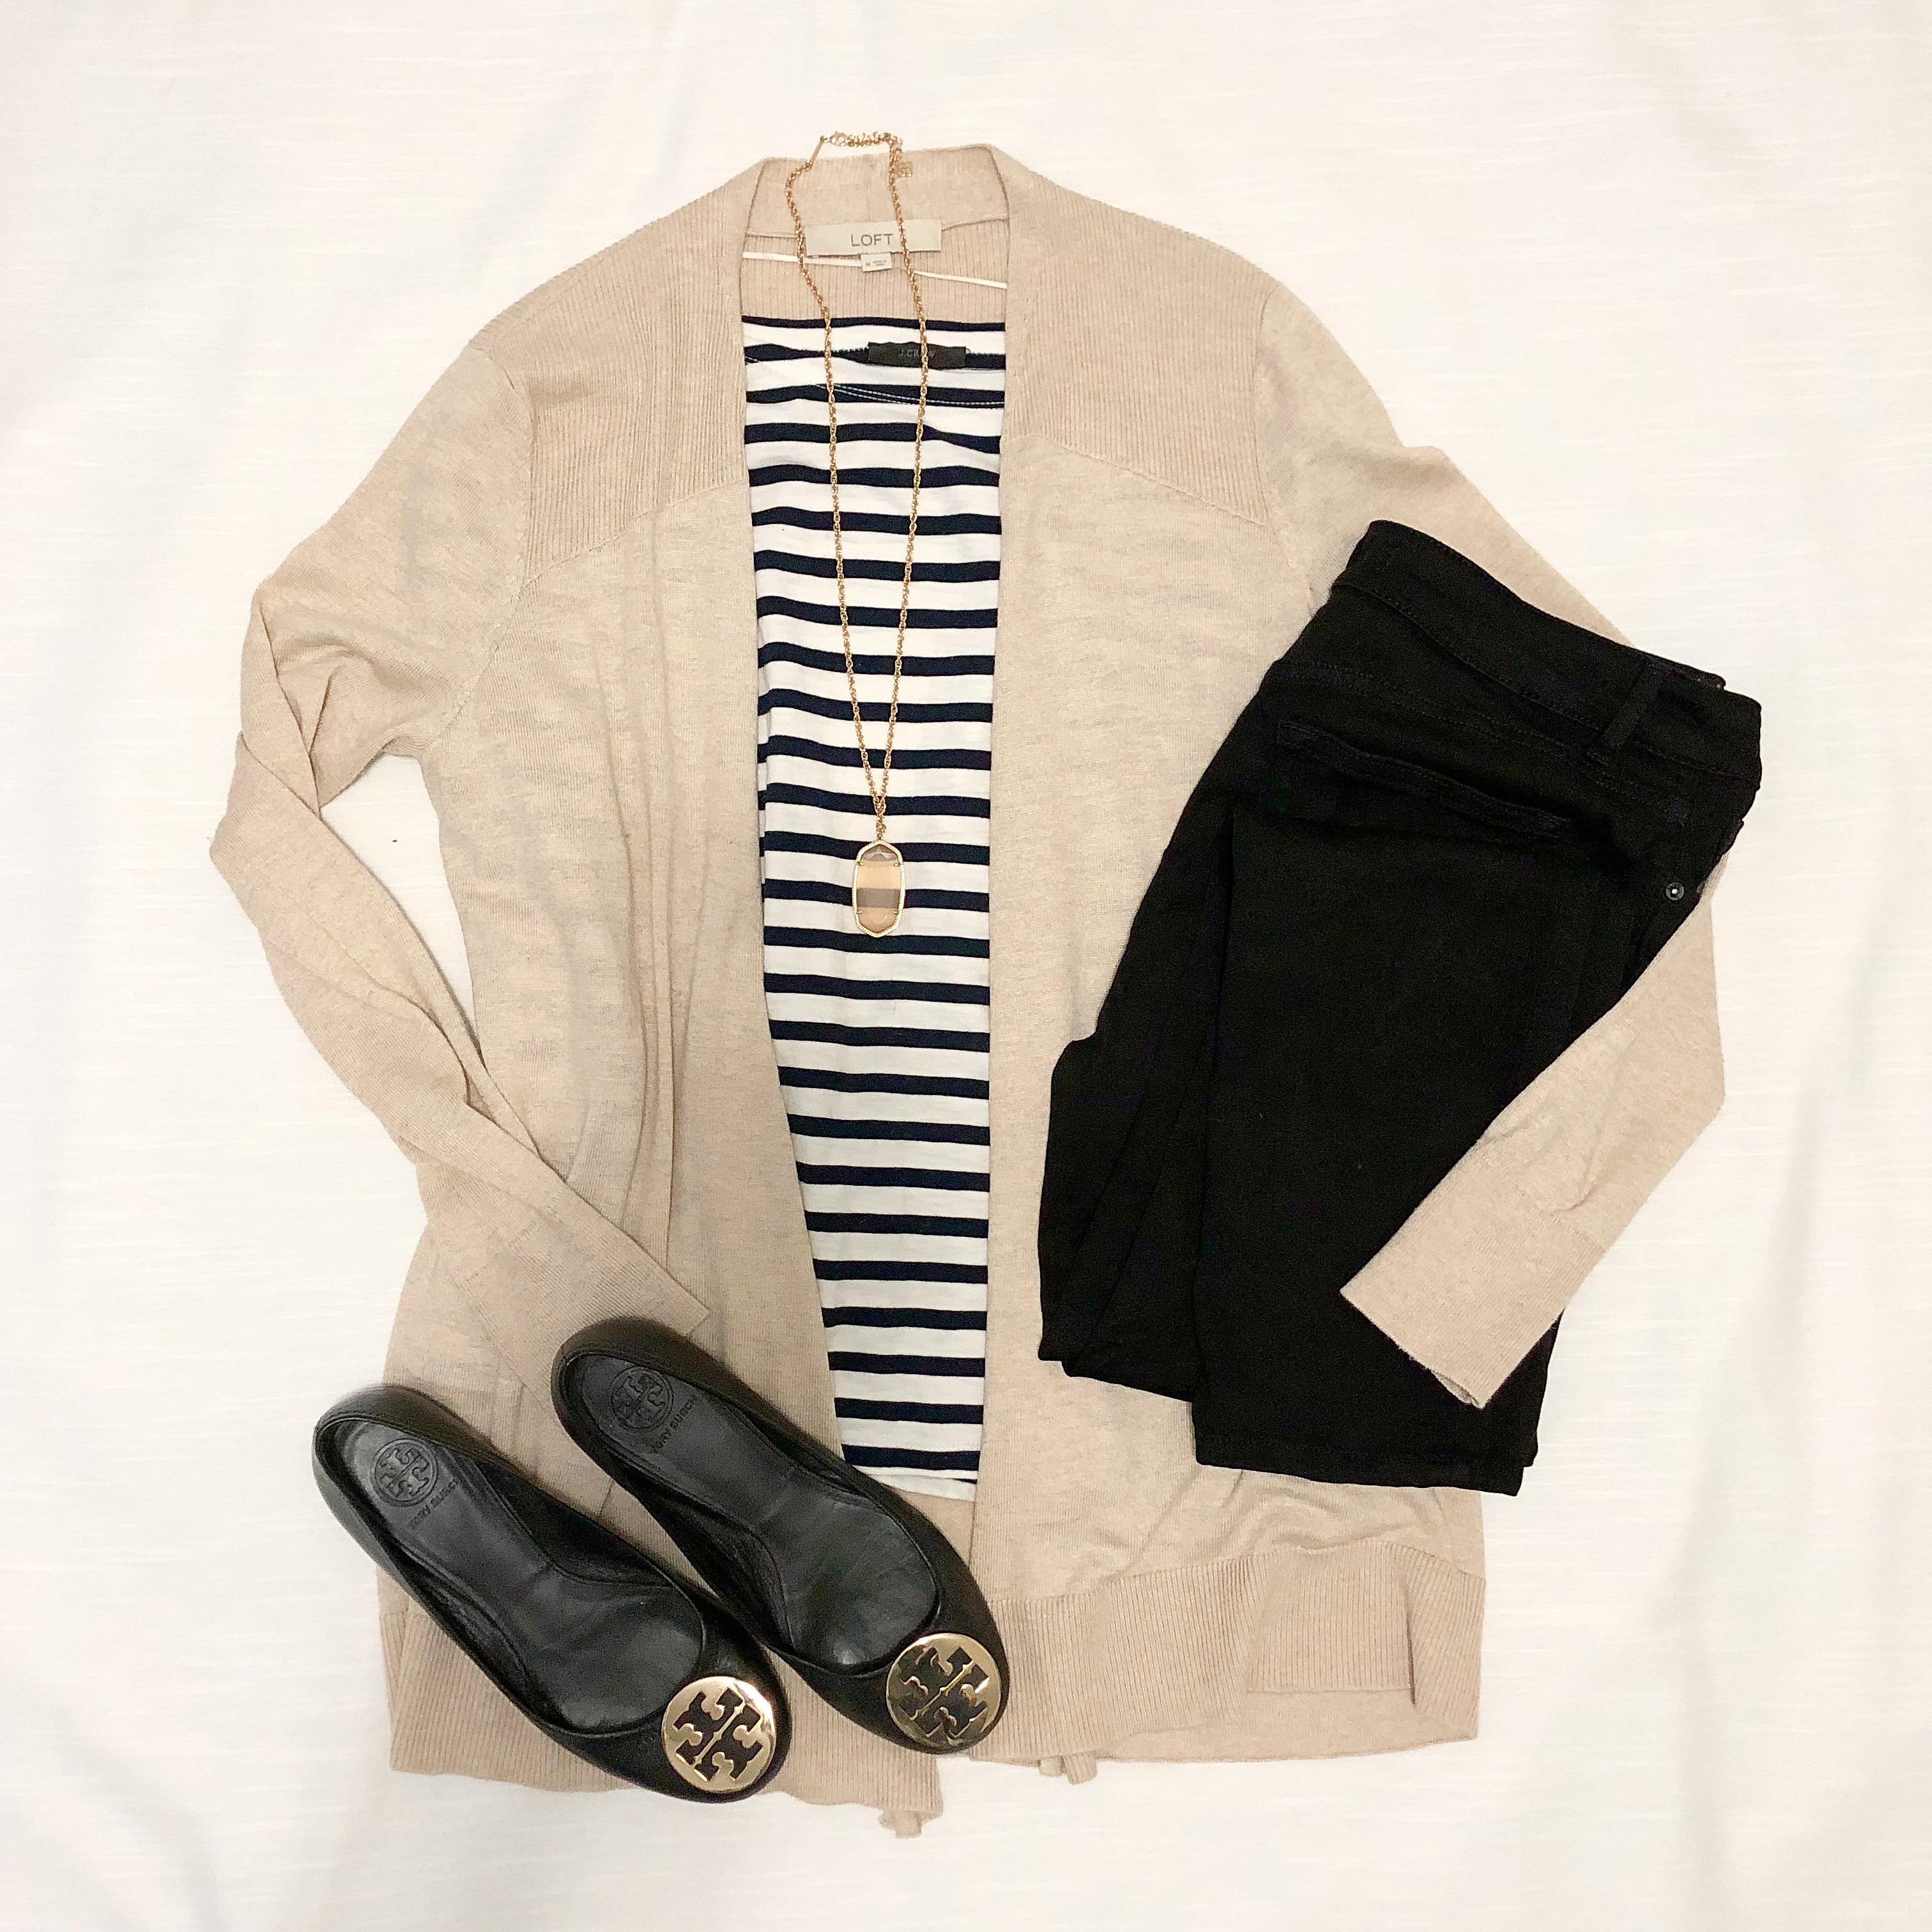 Instagram September 2018 - J Crew striped top, black jeans, beige cardigan, Tory Burch flats